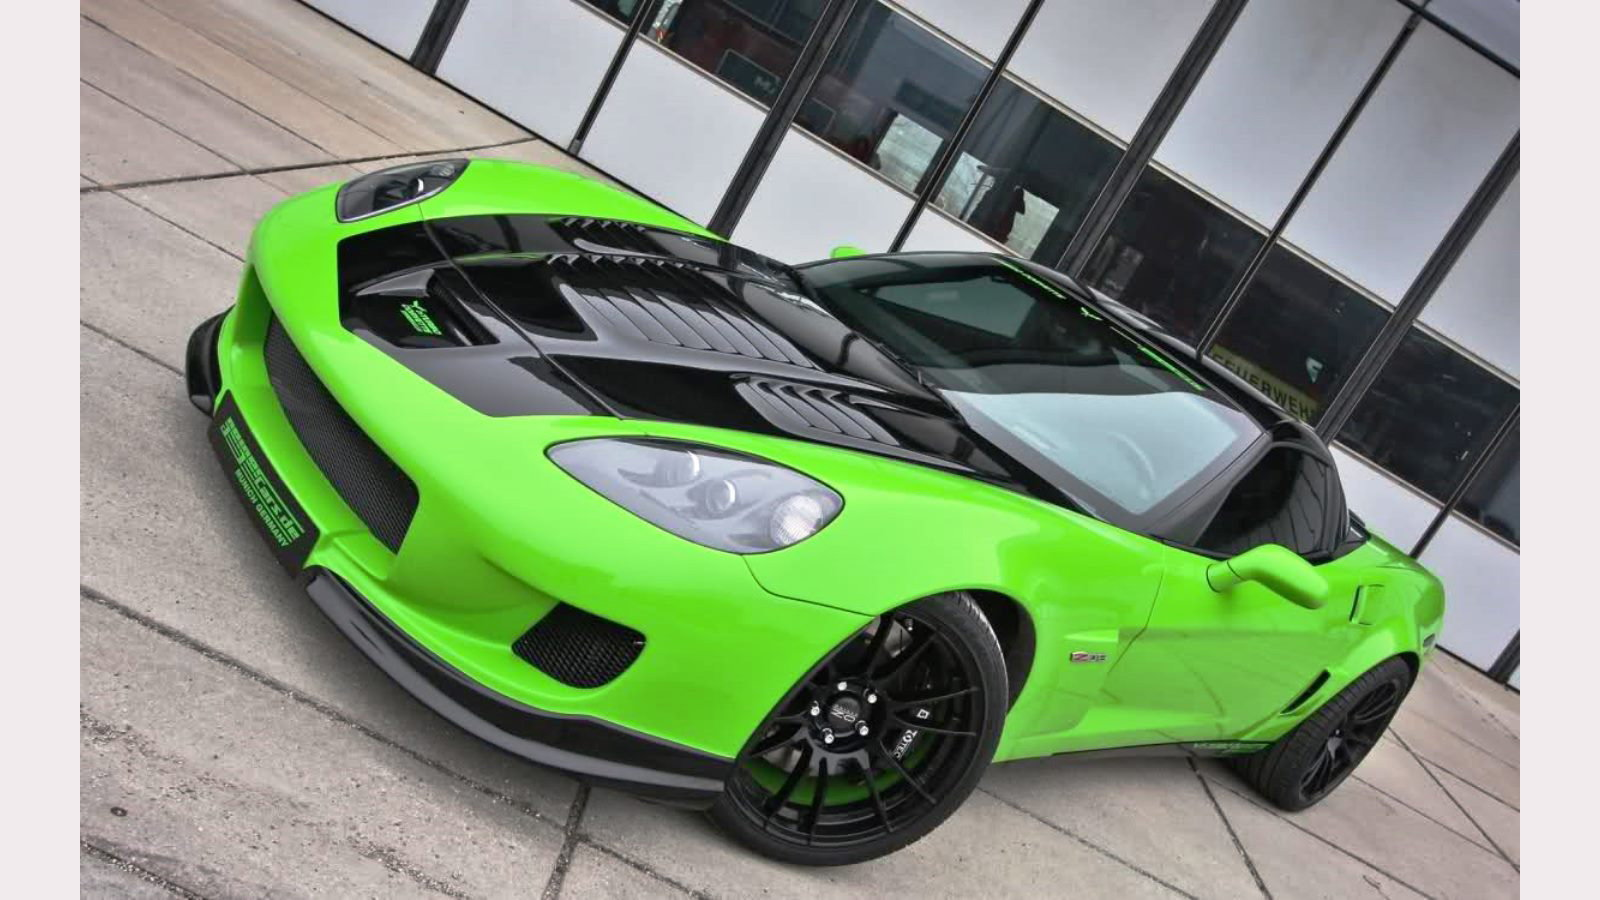 2009 Bright Green Geiger Corvette